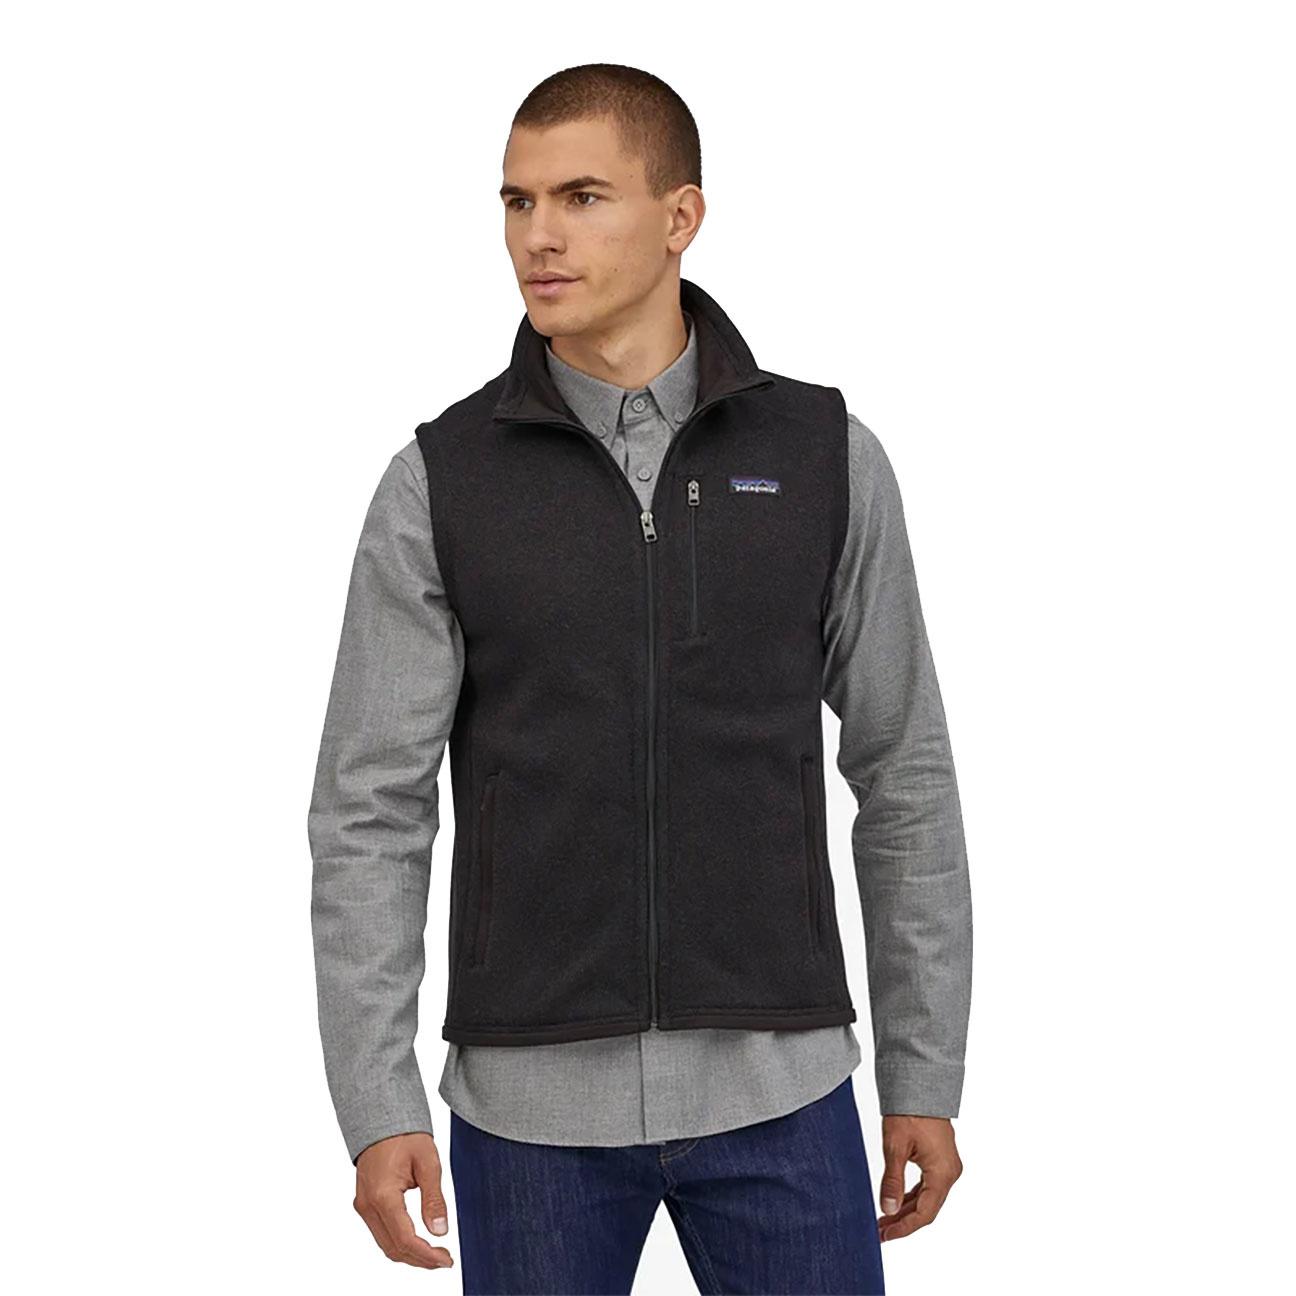 Men's Better Sweater Fleece Vest, Black-2